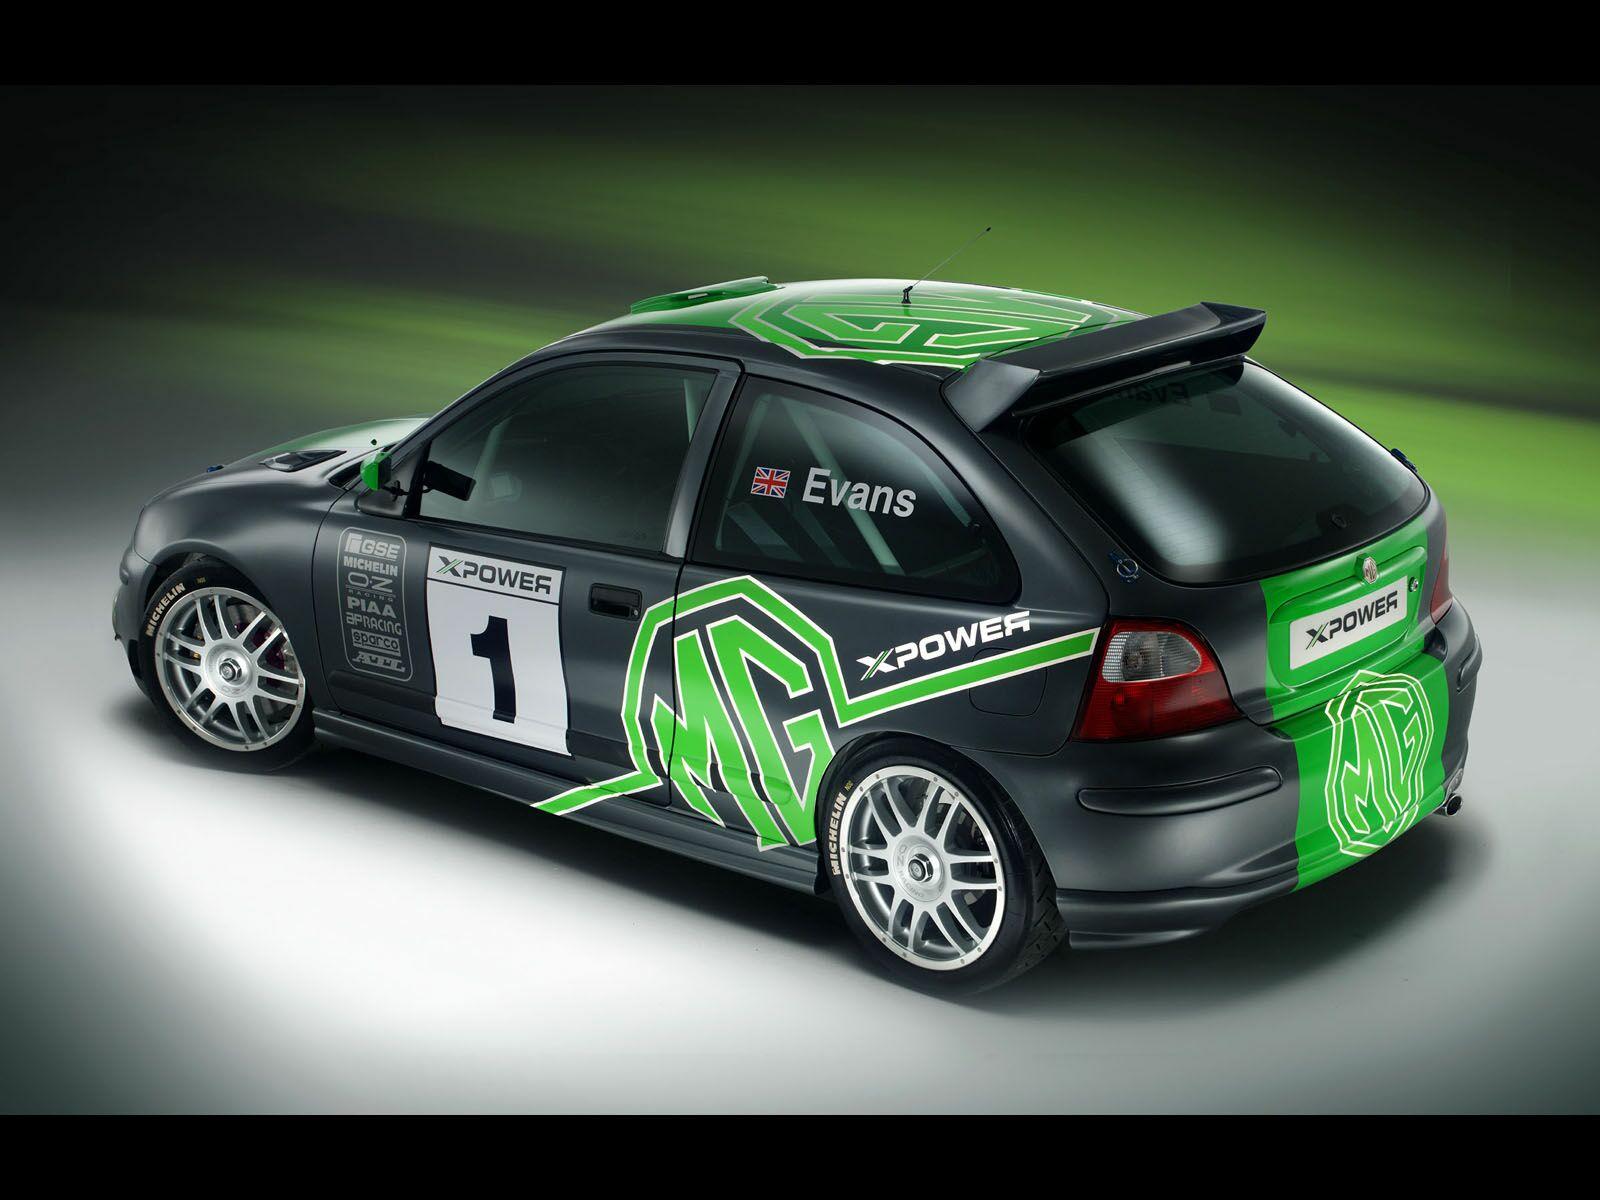 Amazing Mg Racing Cars Gallery - Classic Cars Ideas - boiq.info